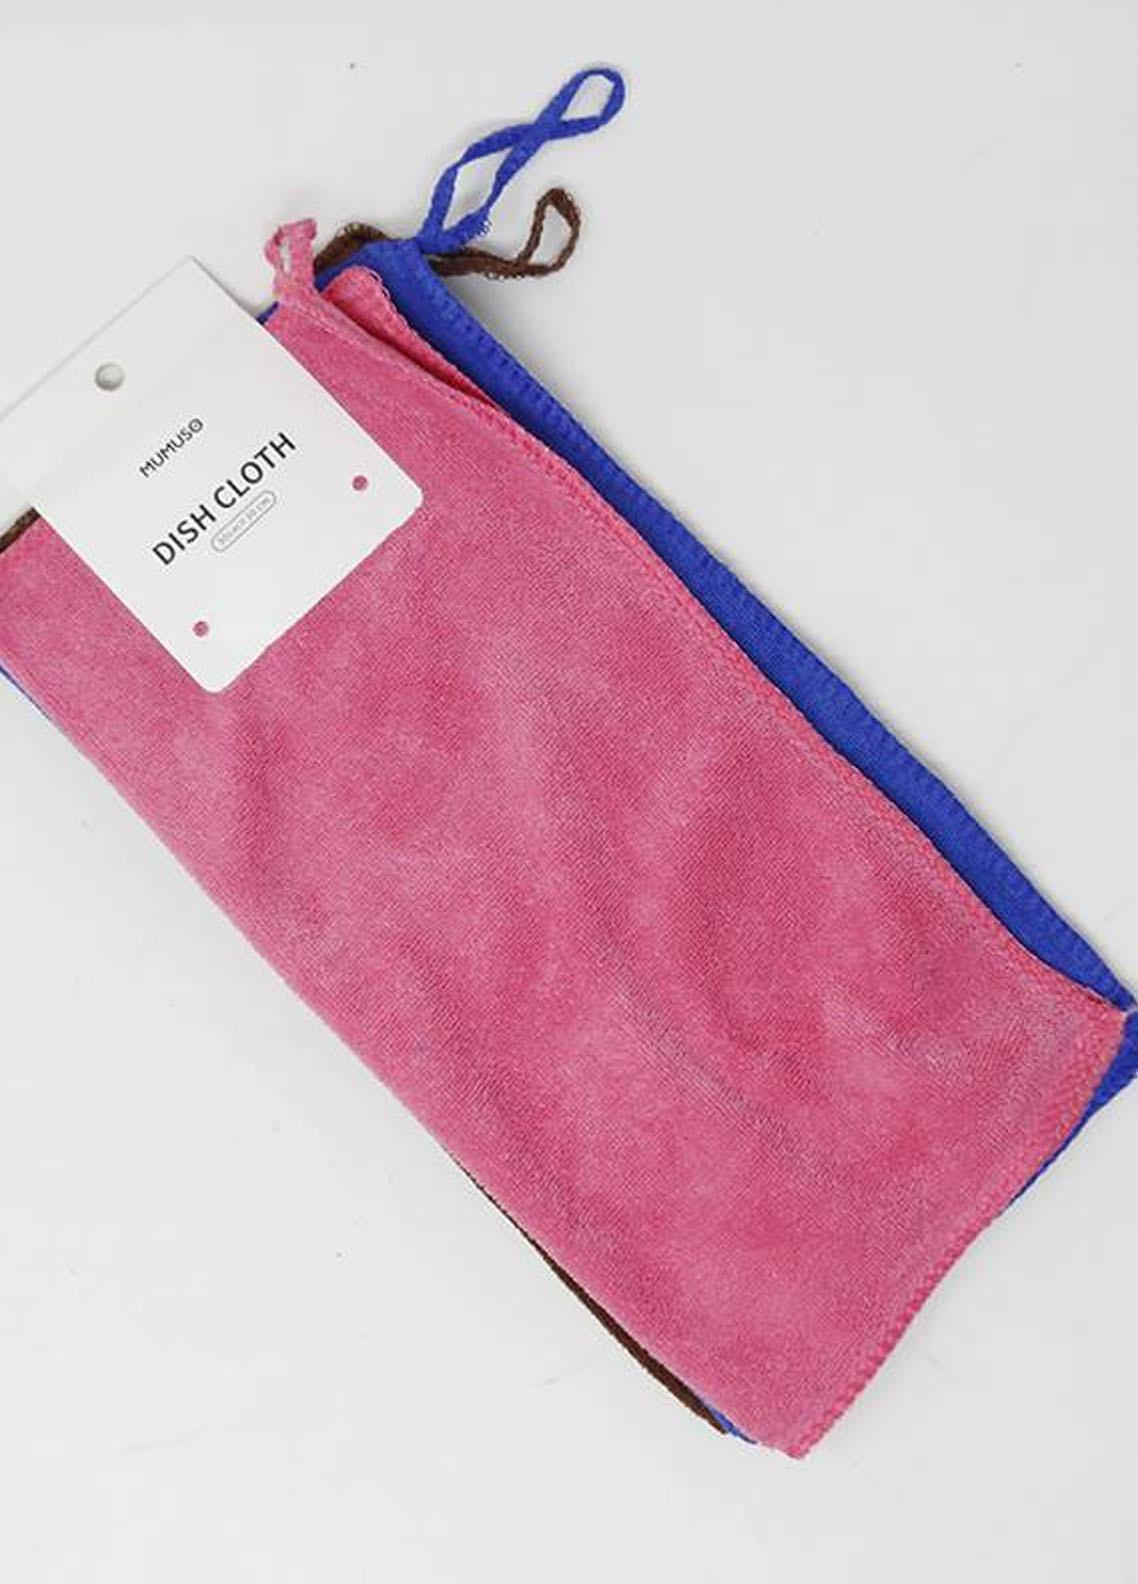 Mumuso MICROFIBER DISH CLOTH SET (3-PACK)